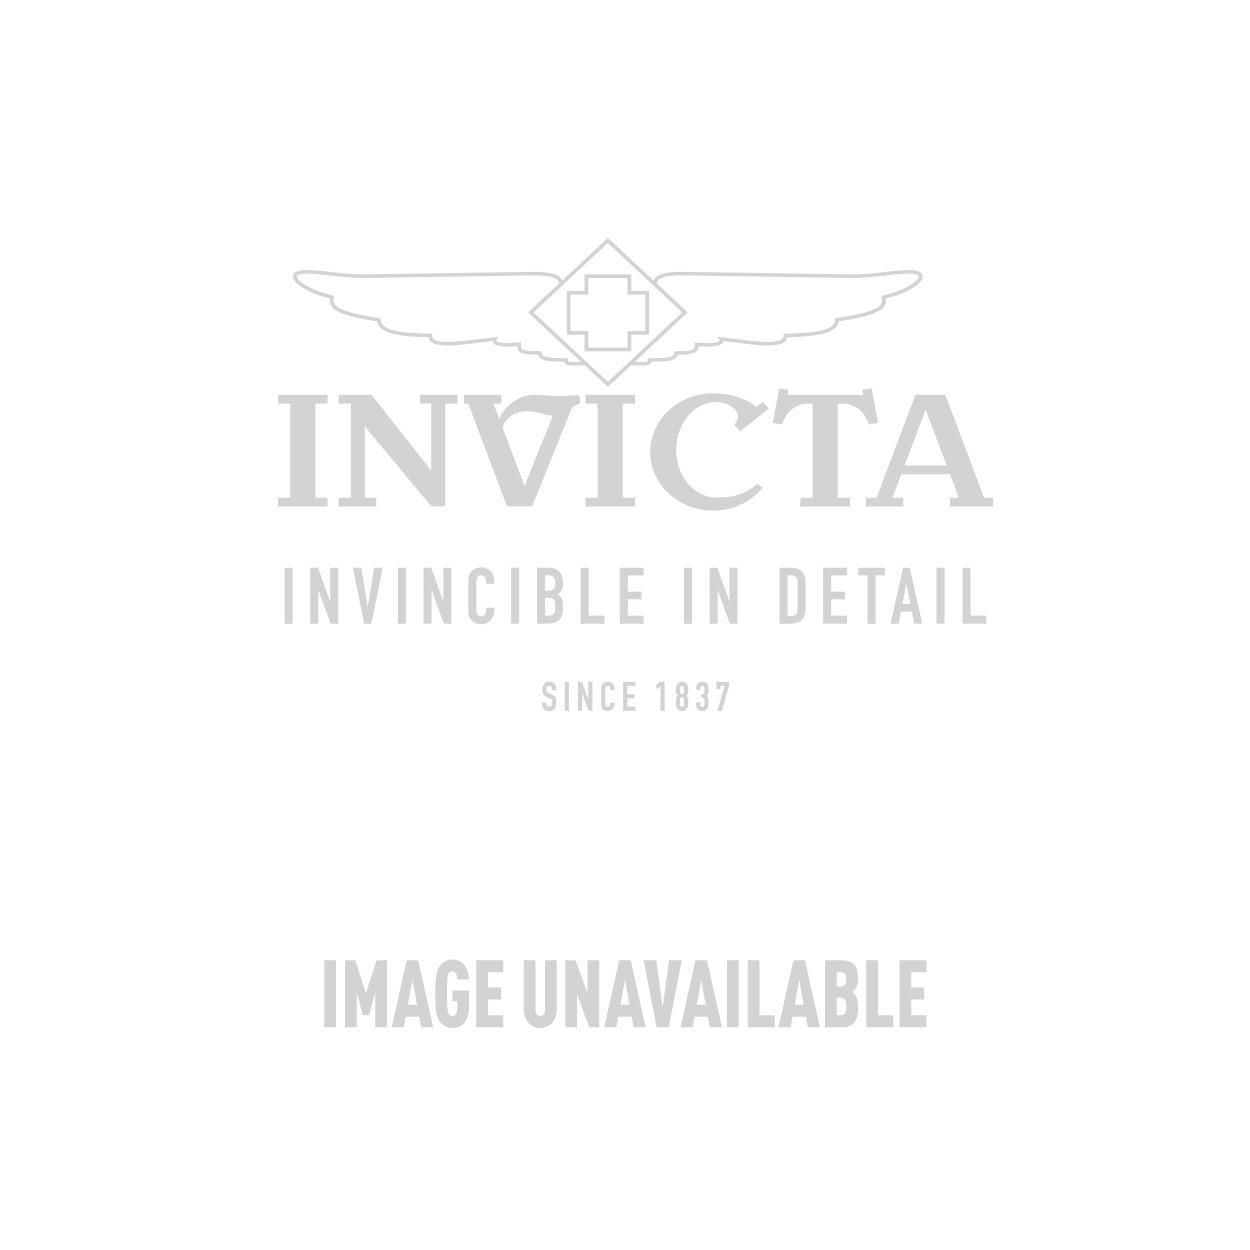 Invicta Sea Hunter Swiss Made Quartz Watch - Black case with Black tone Polyurethane band - Model 11183